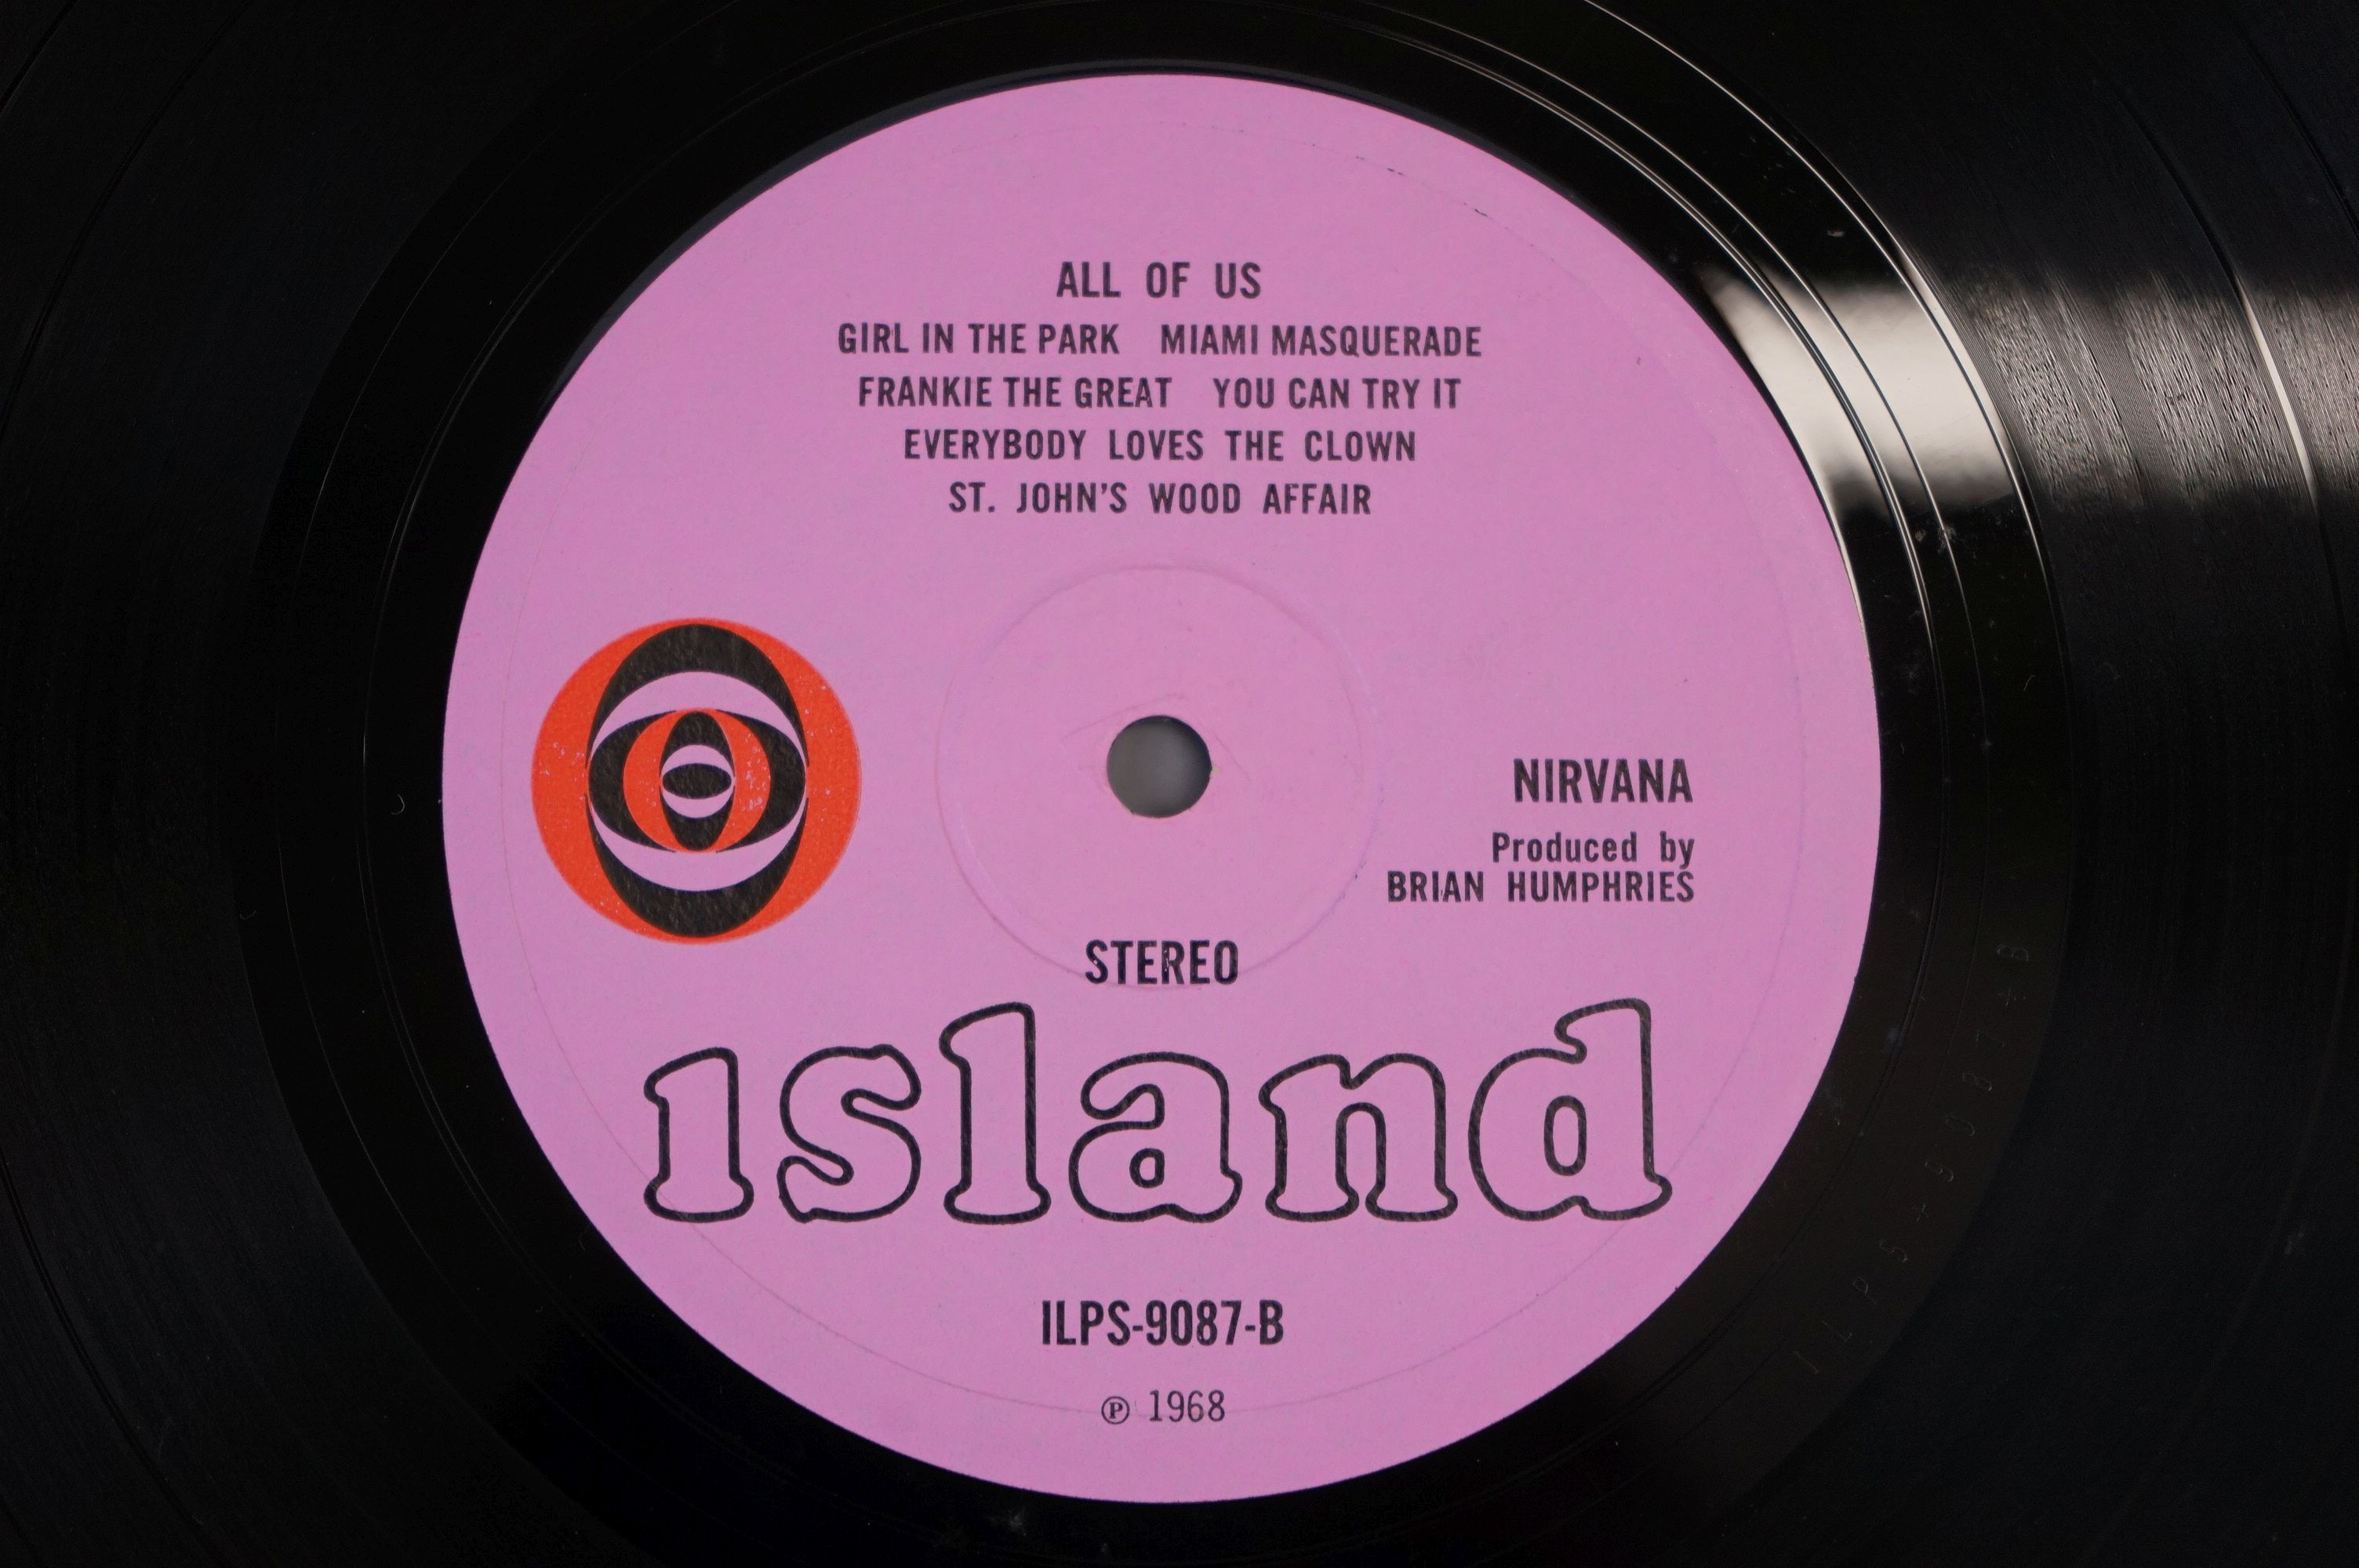 Vinyl - Nirvana All Of Us LP on Island ILPS 9087 with pink label, orange/black circle logo, - Image 5 of 6